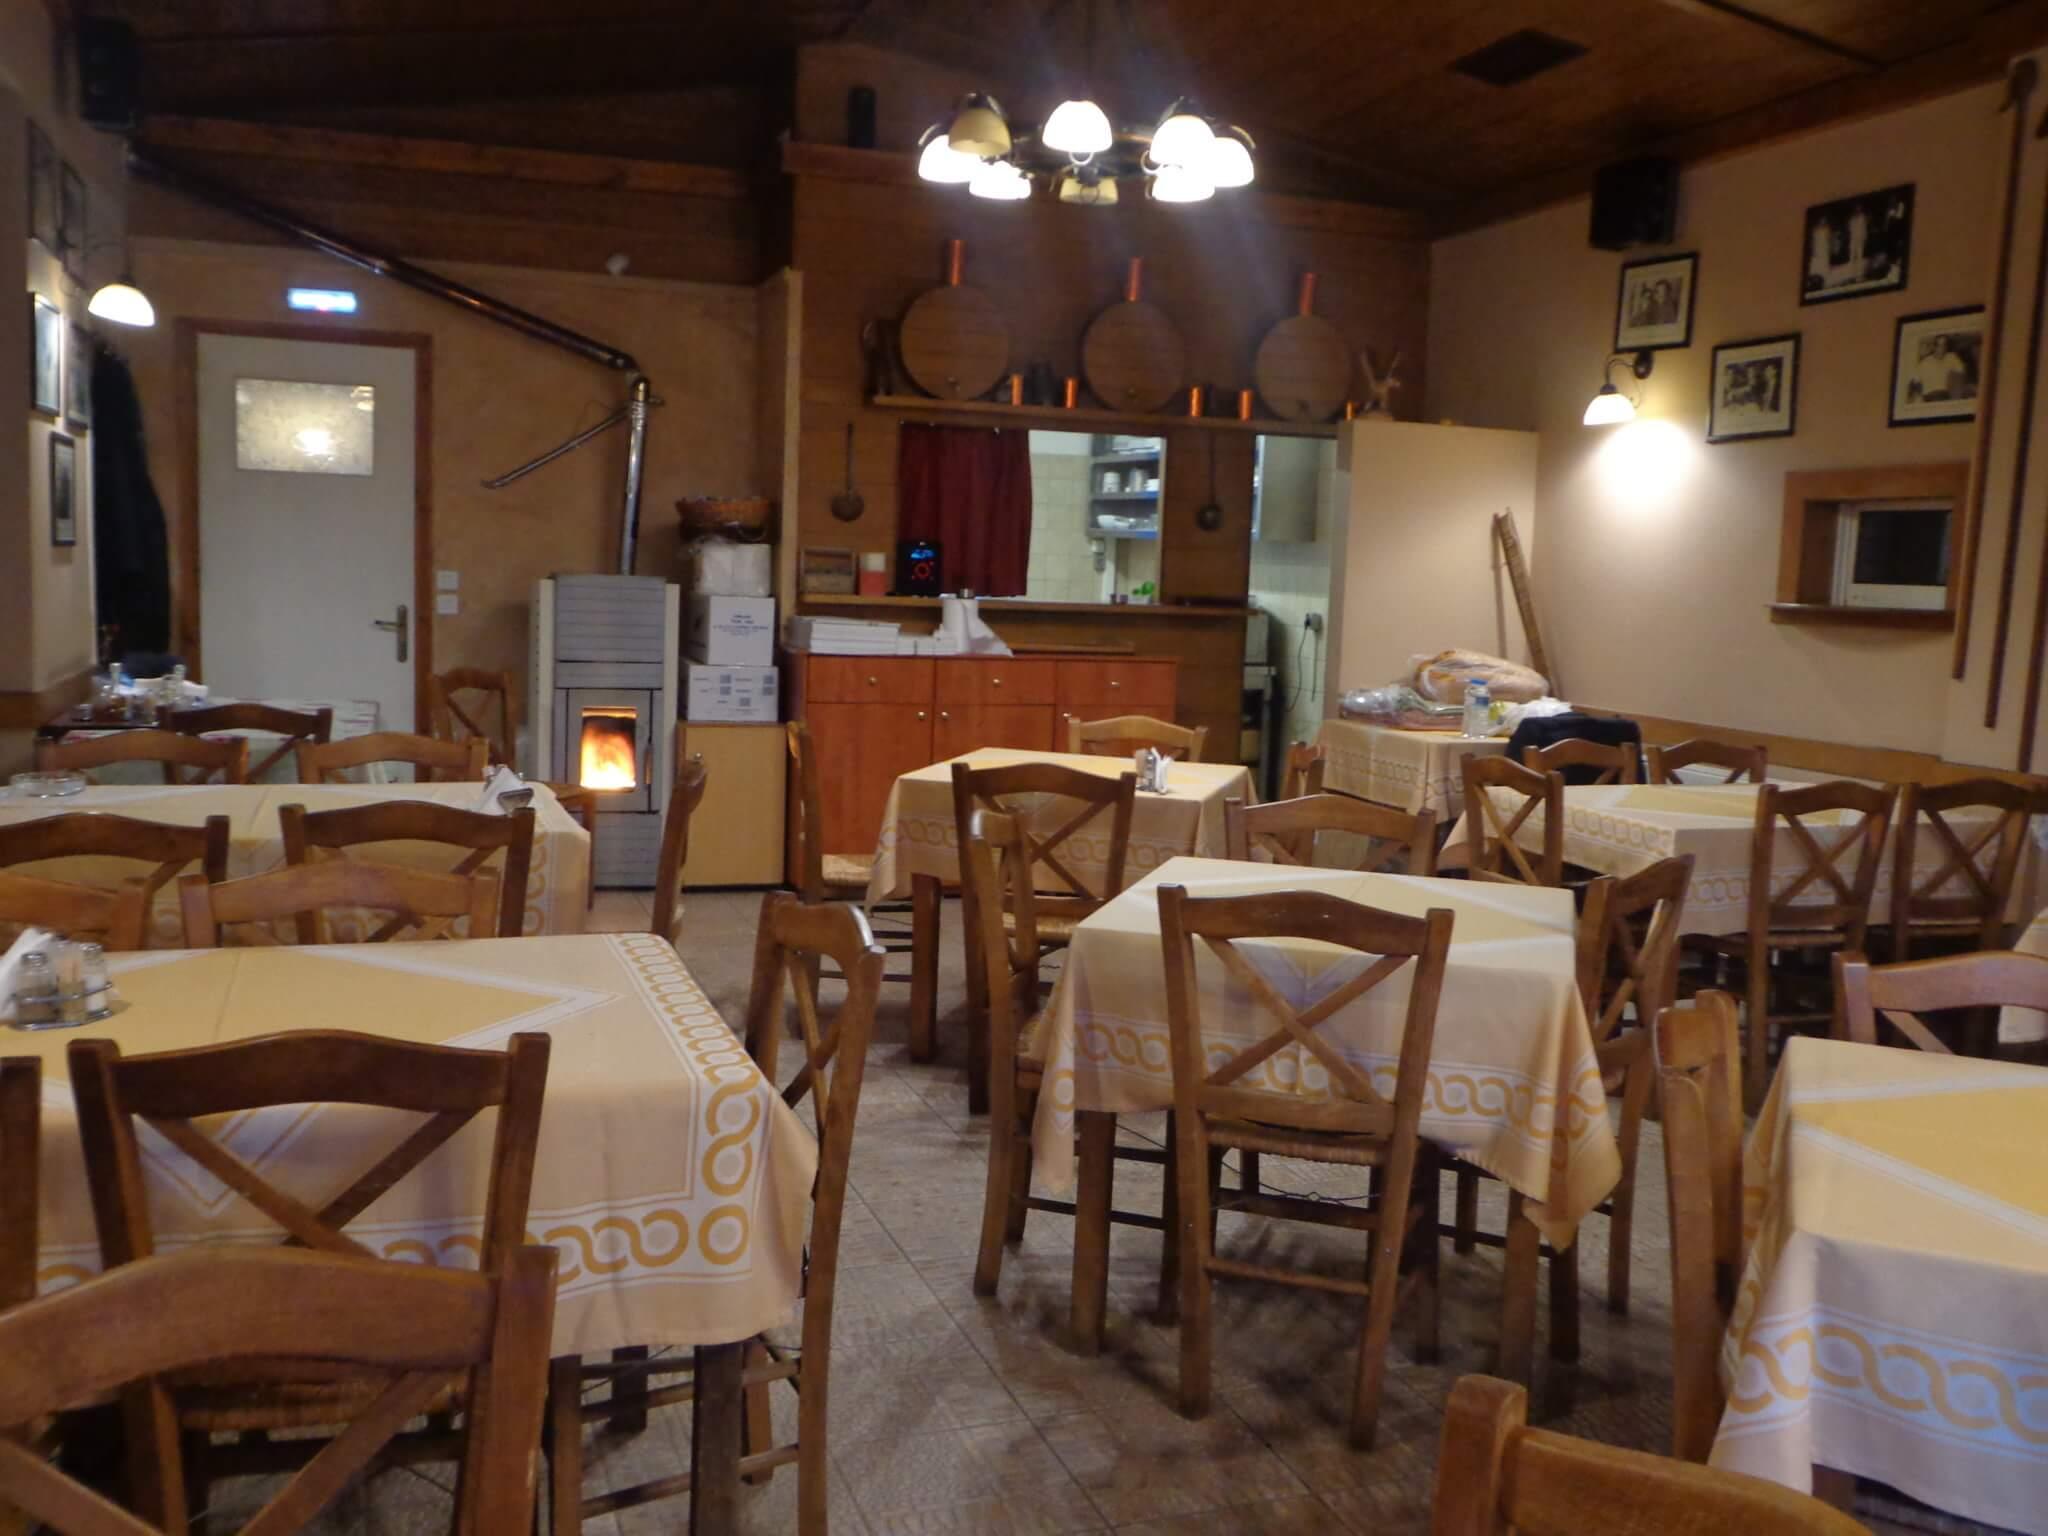 Palyvos restaurant